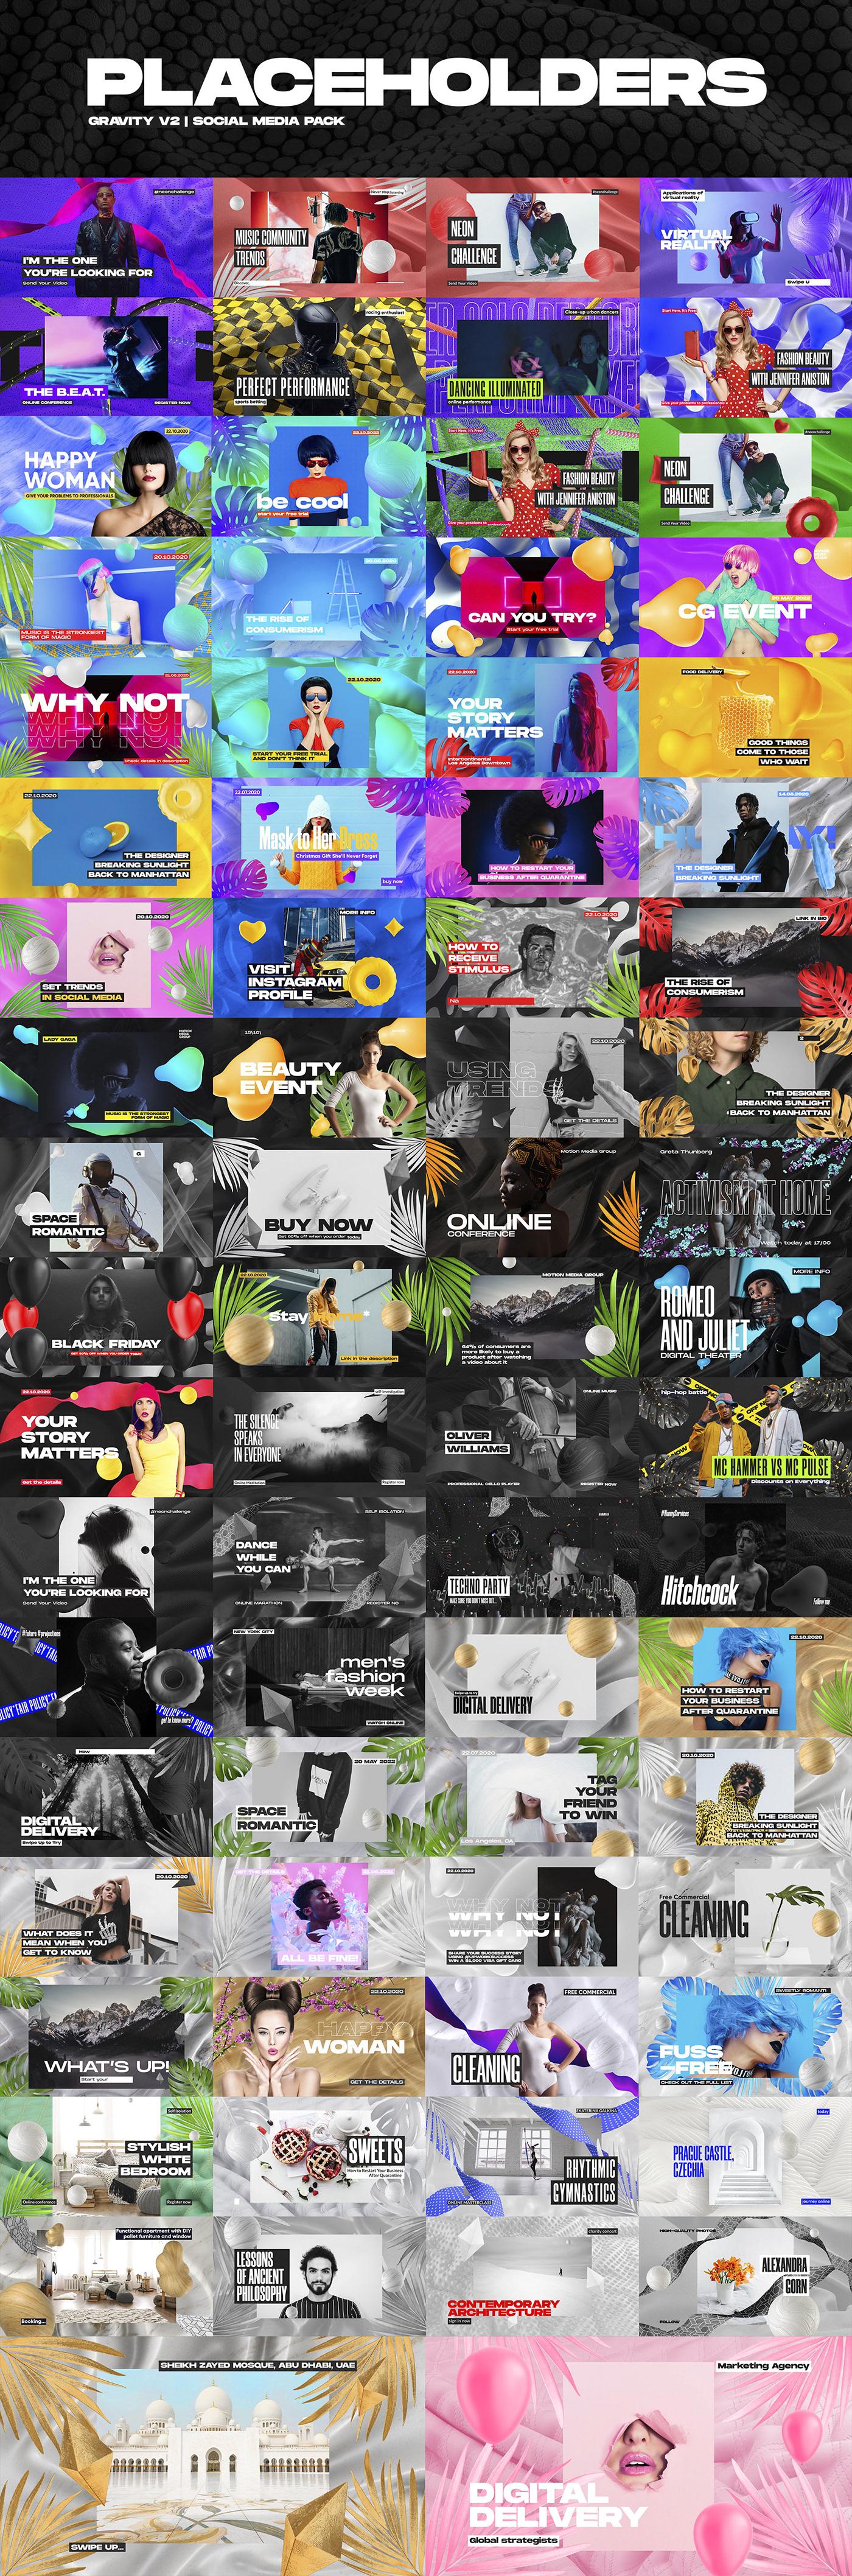 Gravity V2 | Social Media Pack - 1